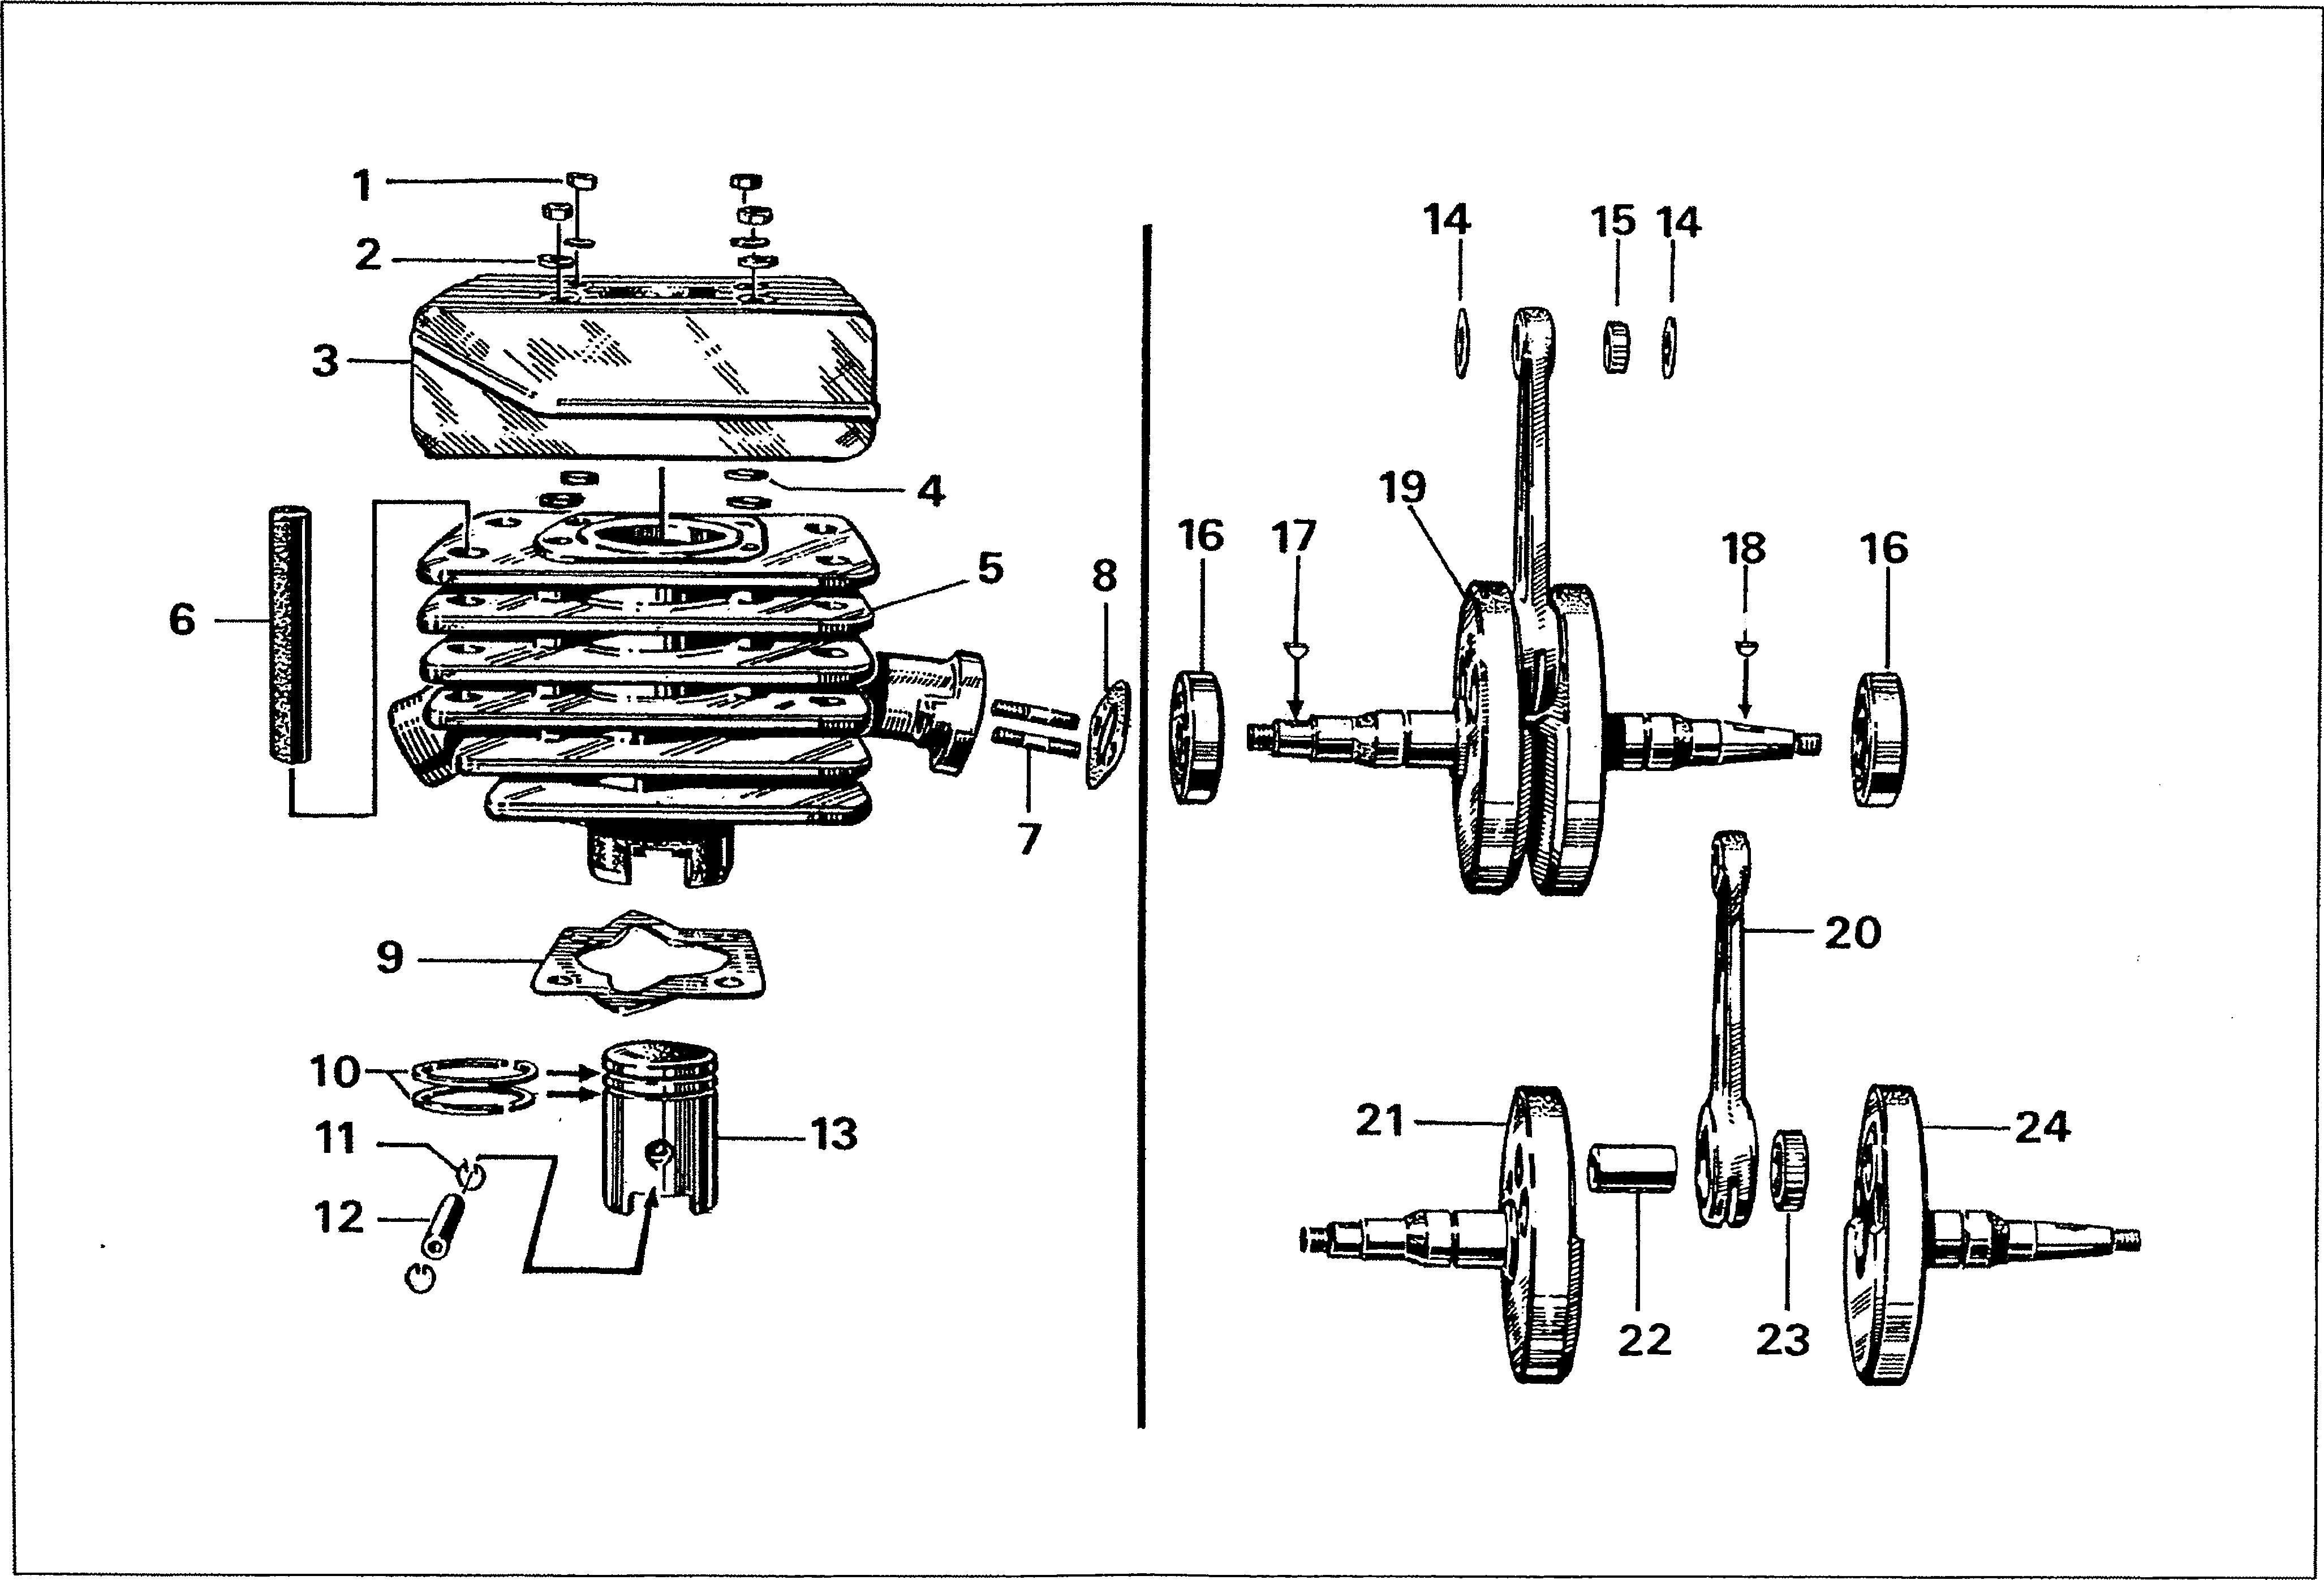 Simson S51 - Cylinder and crankshaft